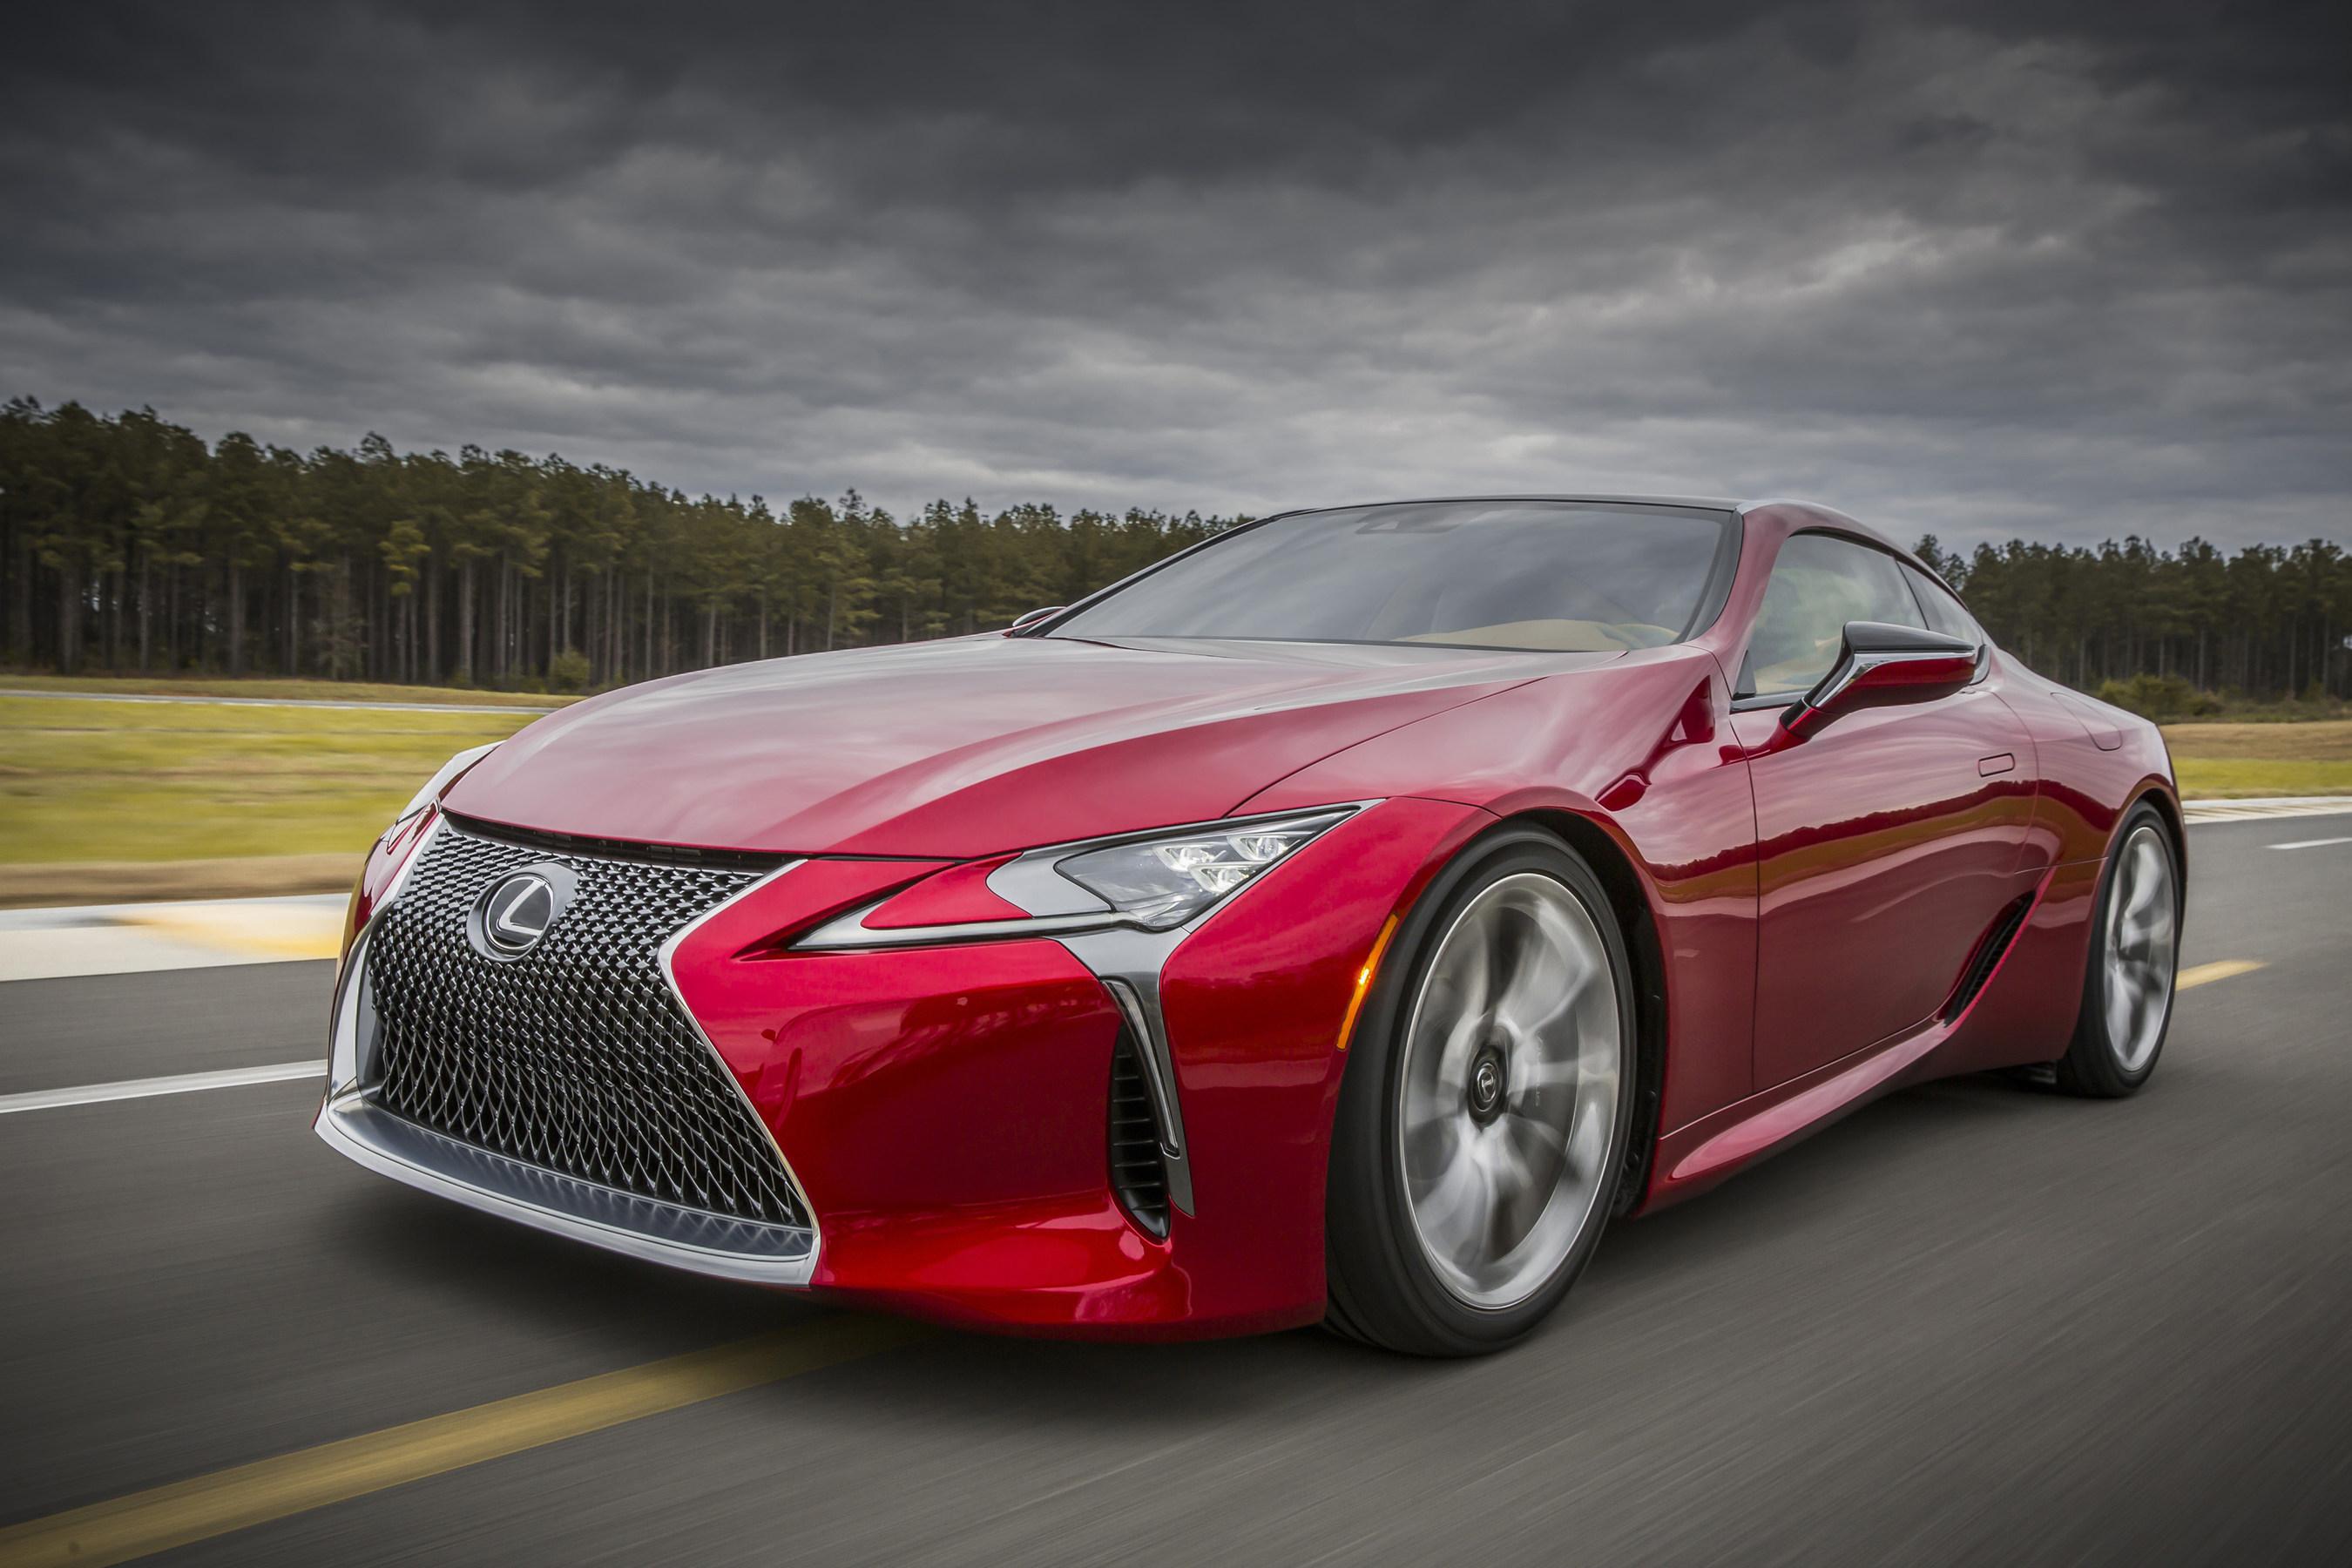 Lexus Aims To Impress In Georgia As Atlanta International Auto Show - Car show world congress center atlanta